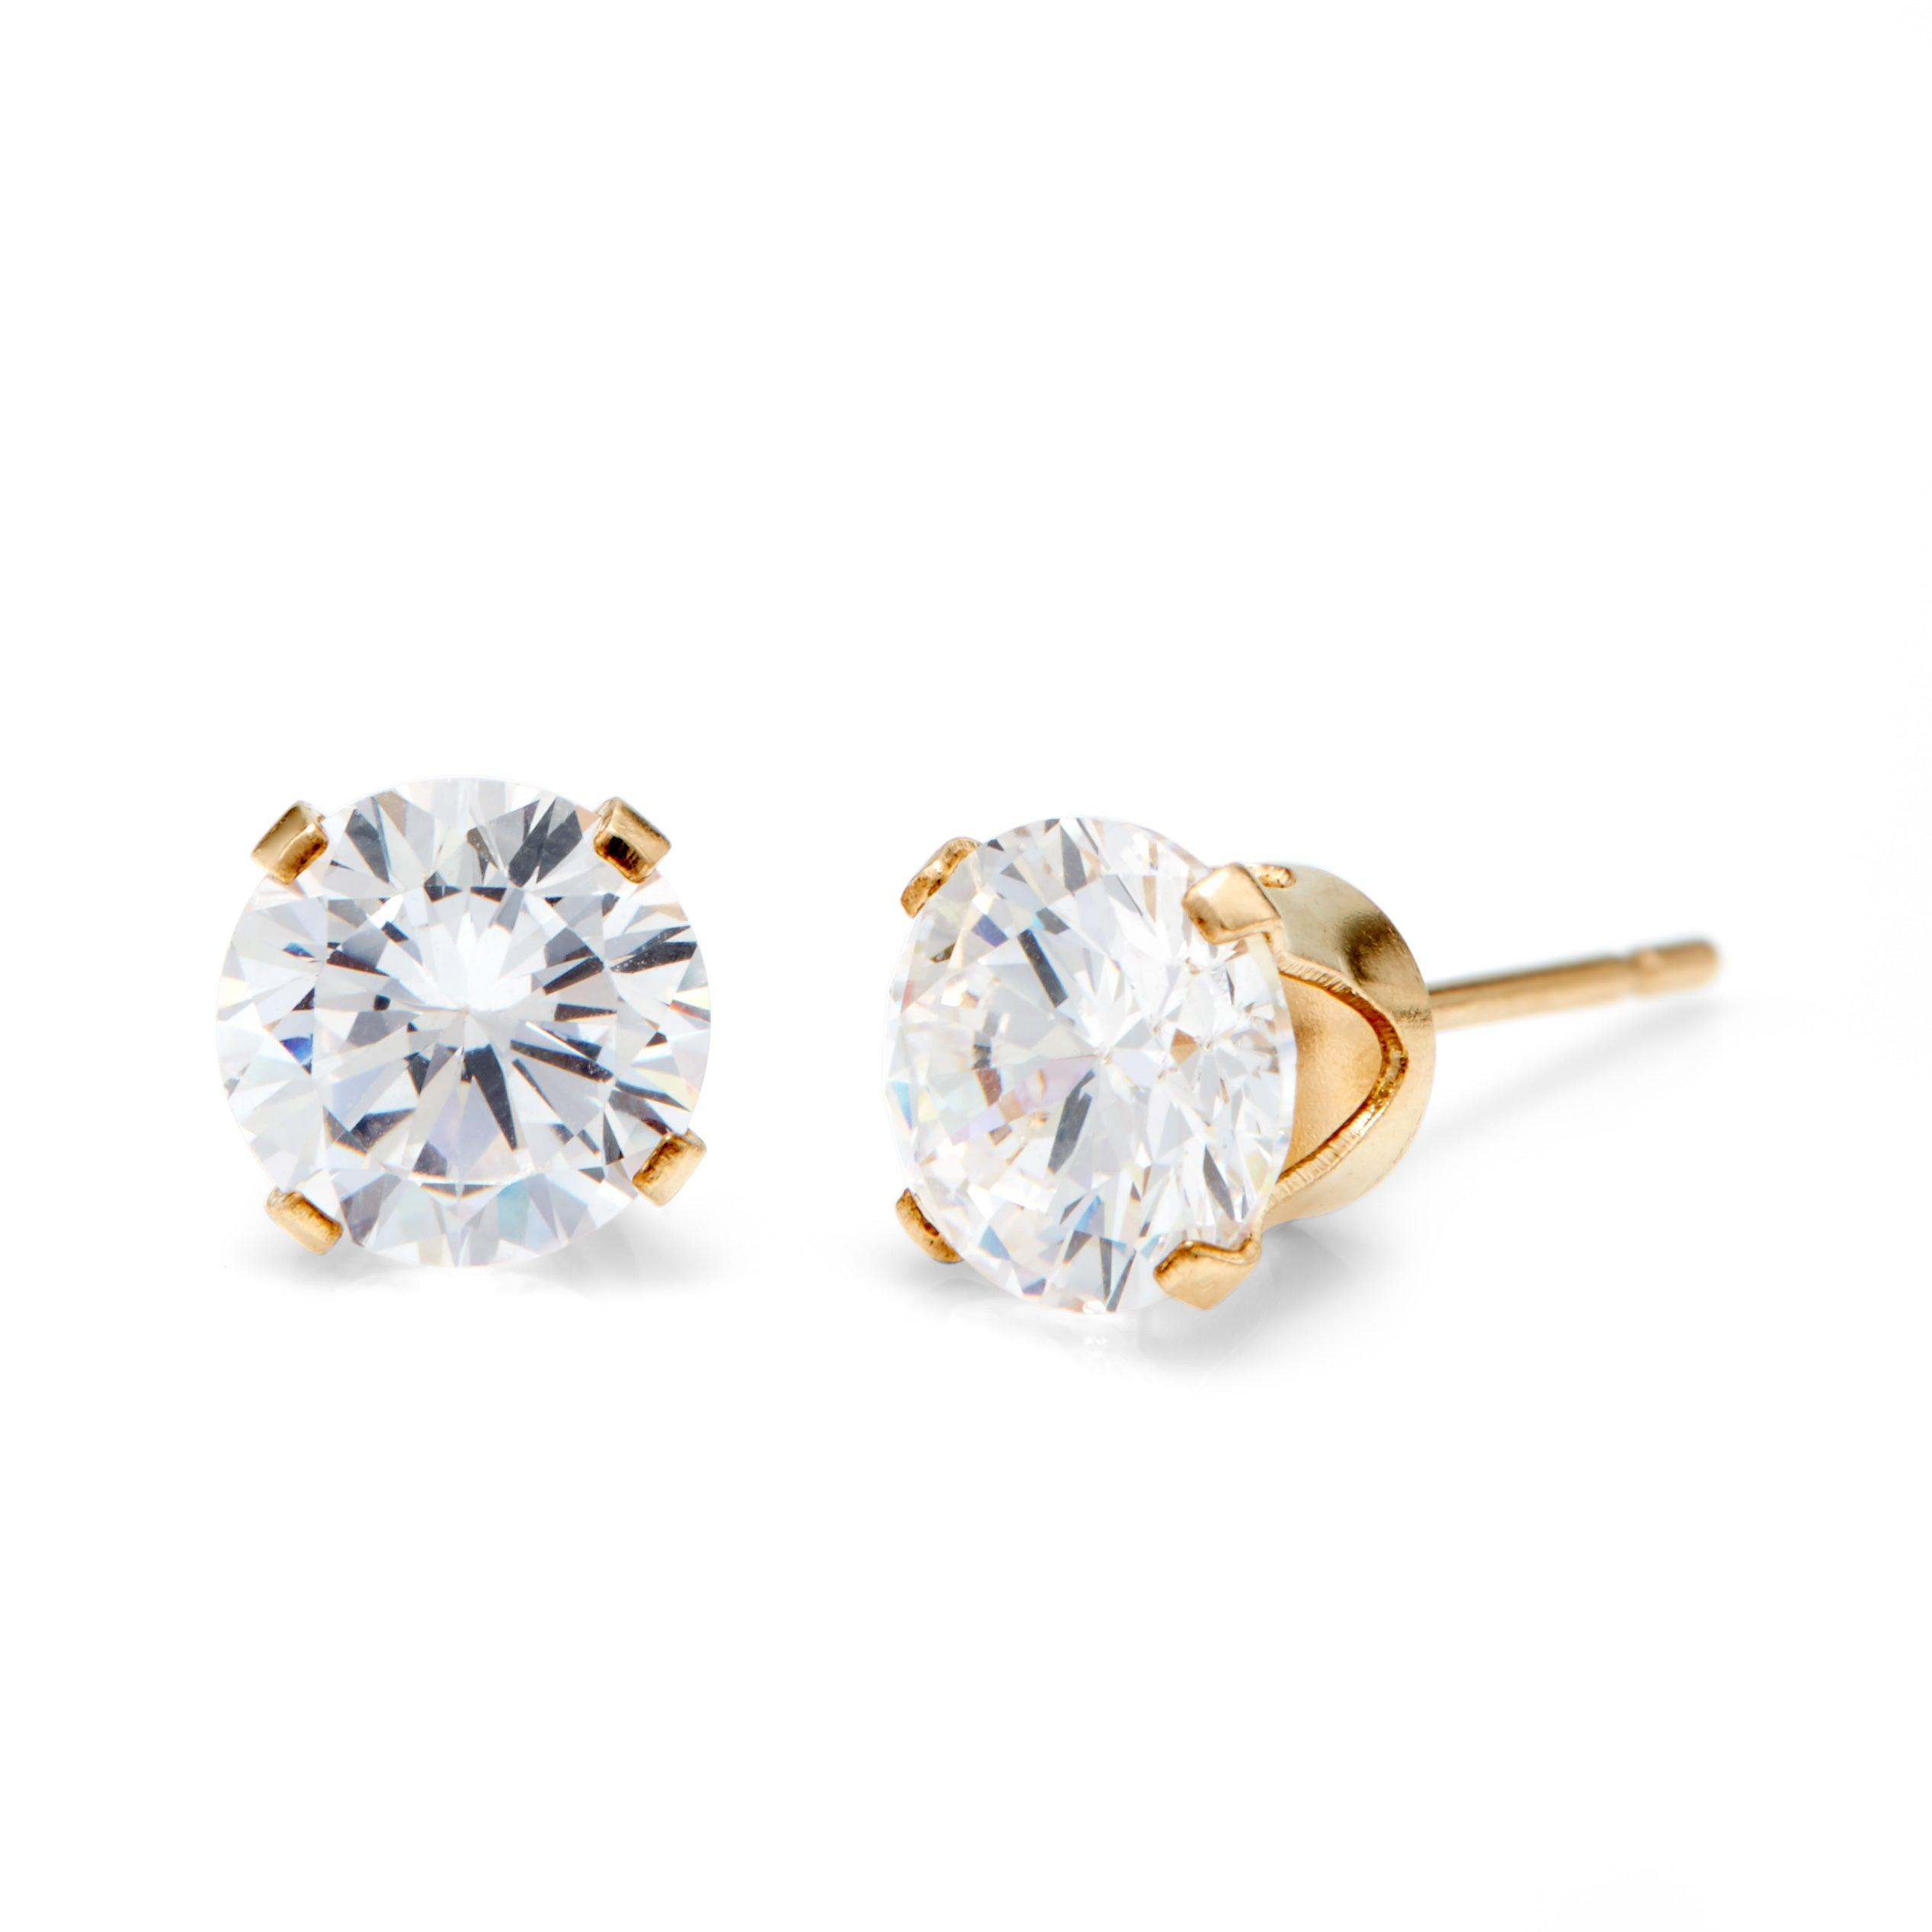 14k Gold Filled Round Diamond Cz 6mm Stud Earrings